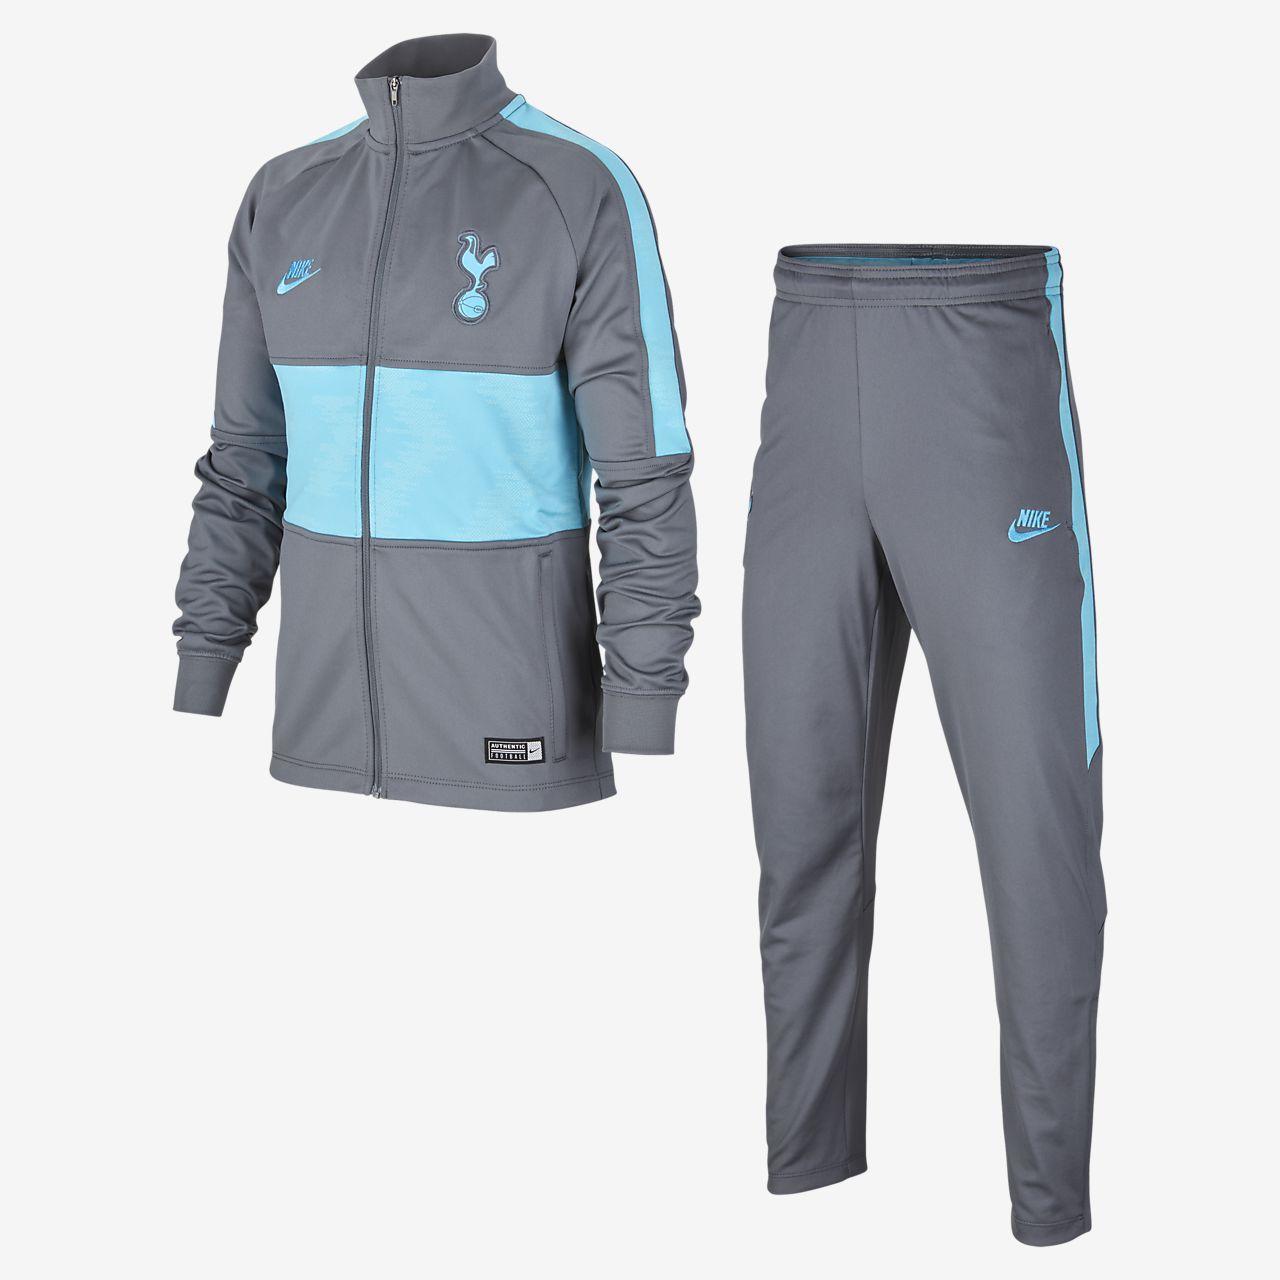 Tuta da calcio Nike Dri-FIT Tottenham Hotspur Strike - Ragazzi